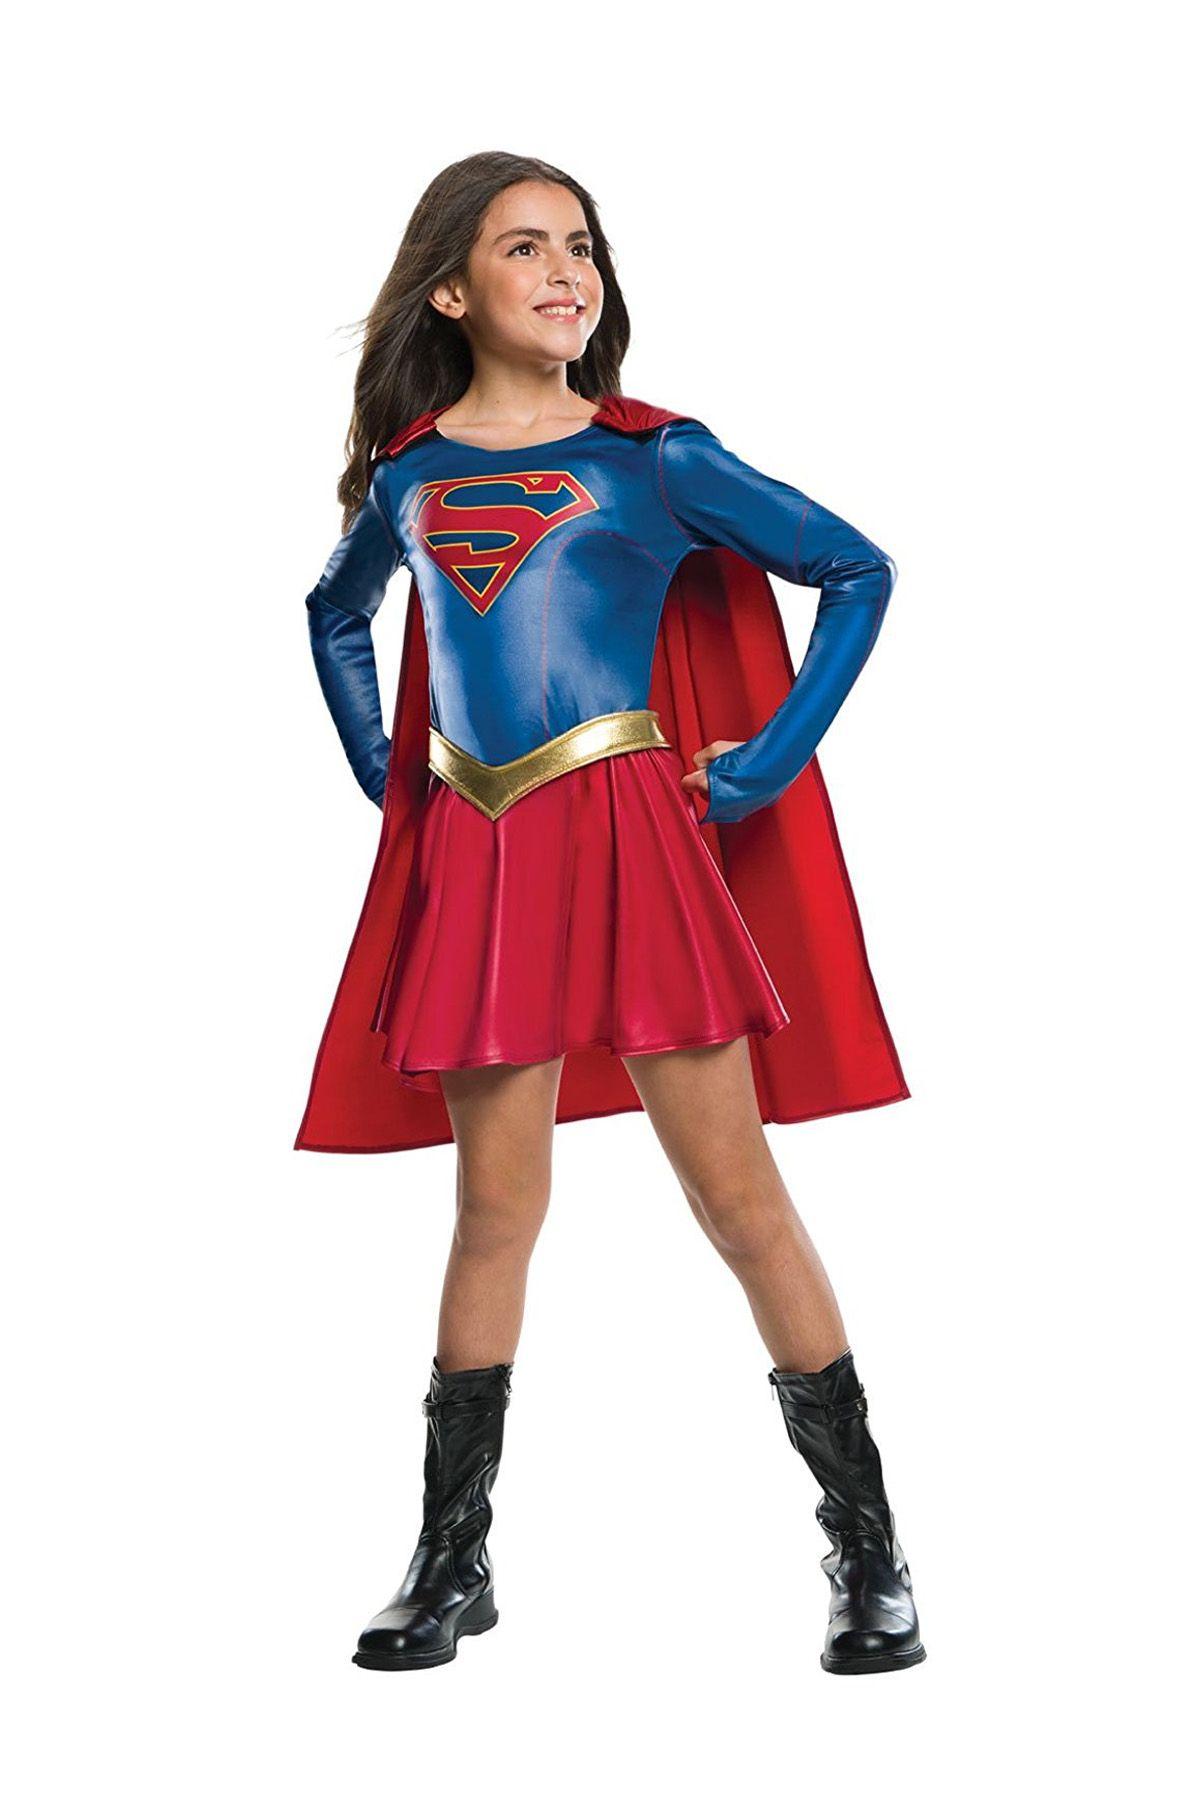 18 best superhero costumes for kids - girls and boys superhero